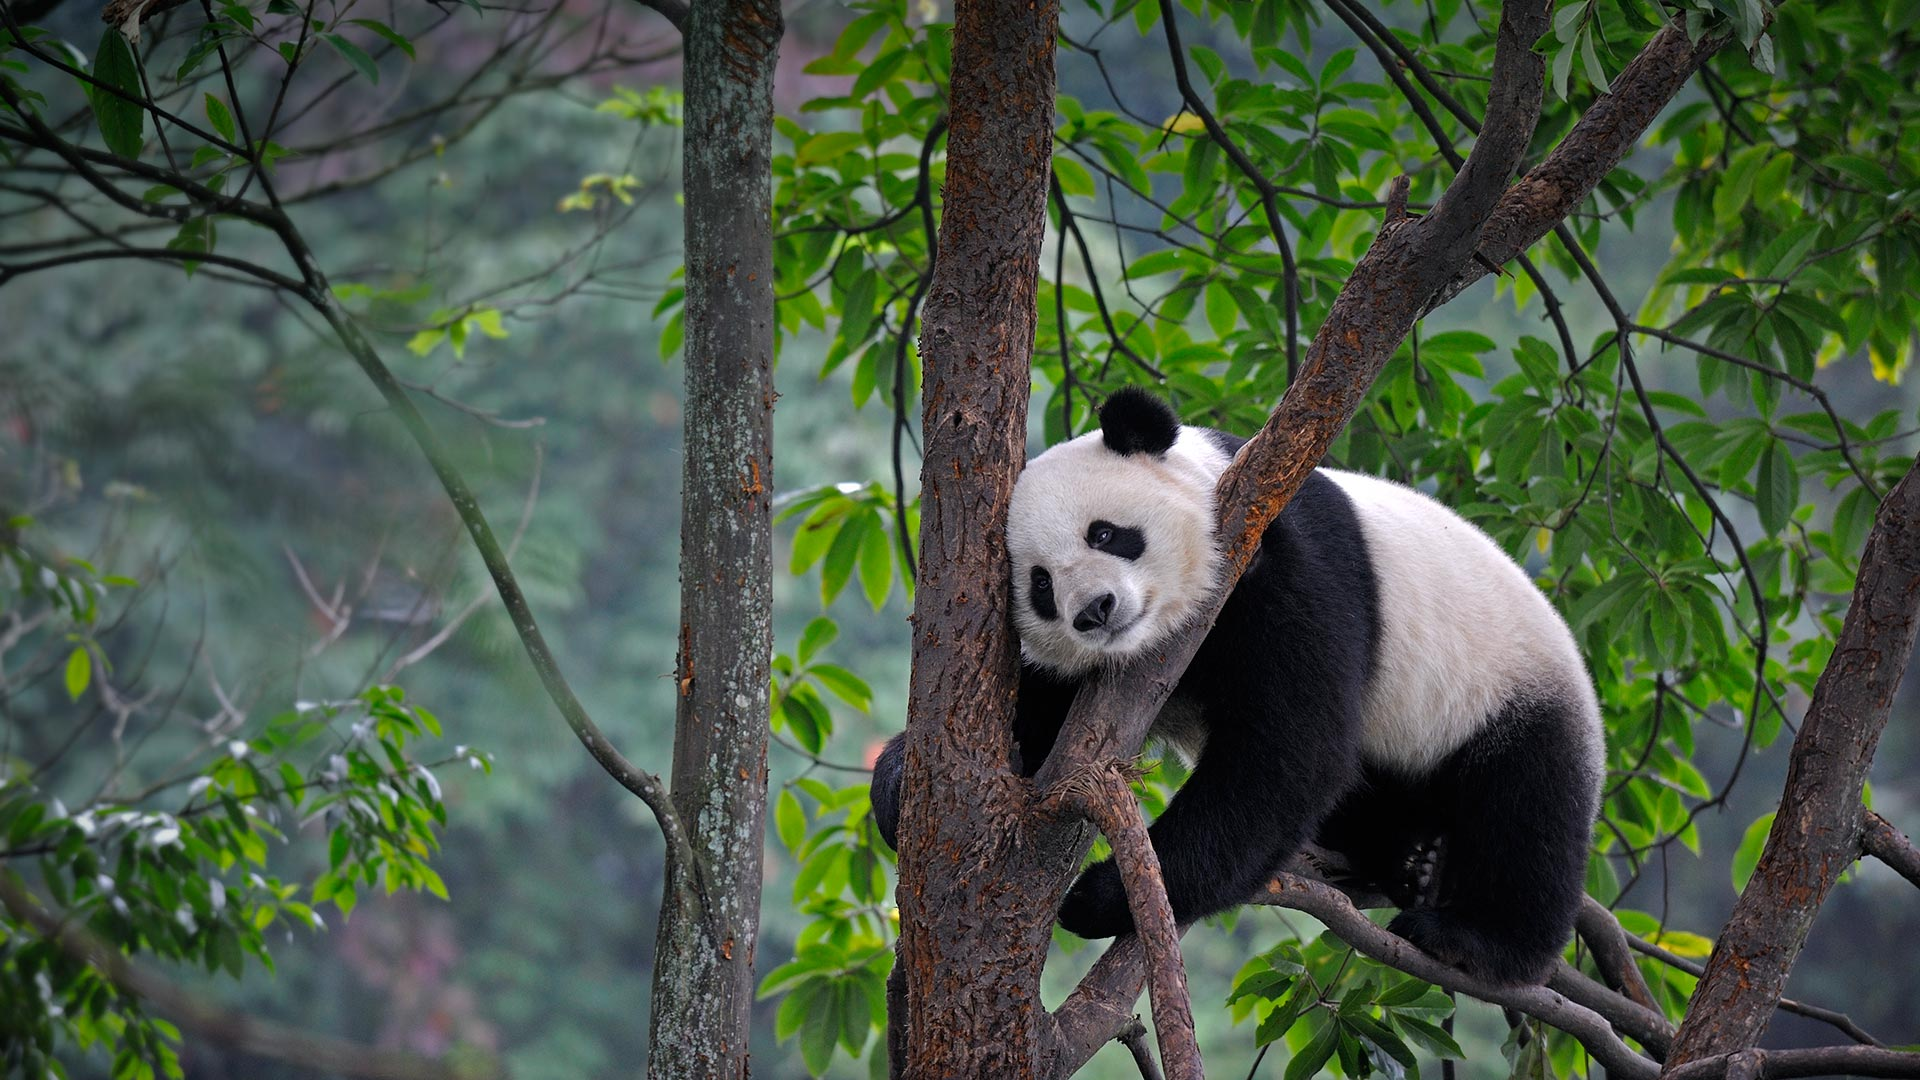 Lazy Panda Video